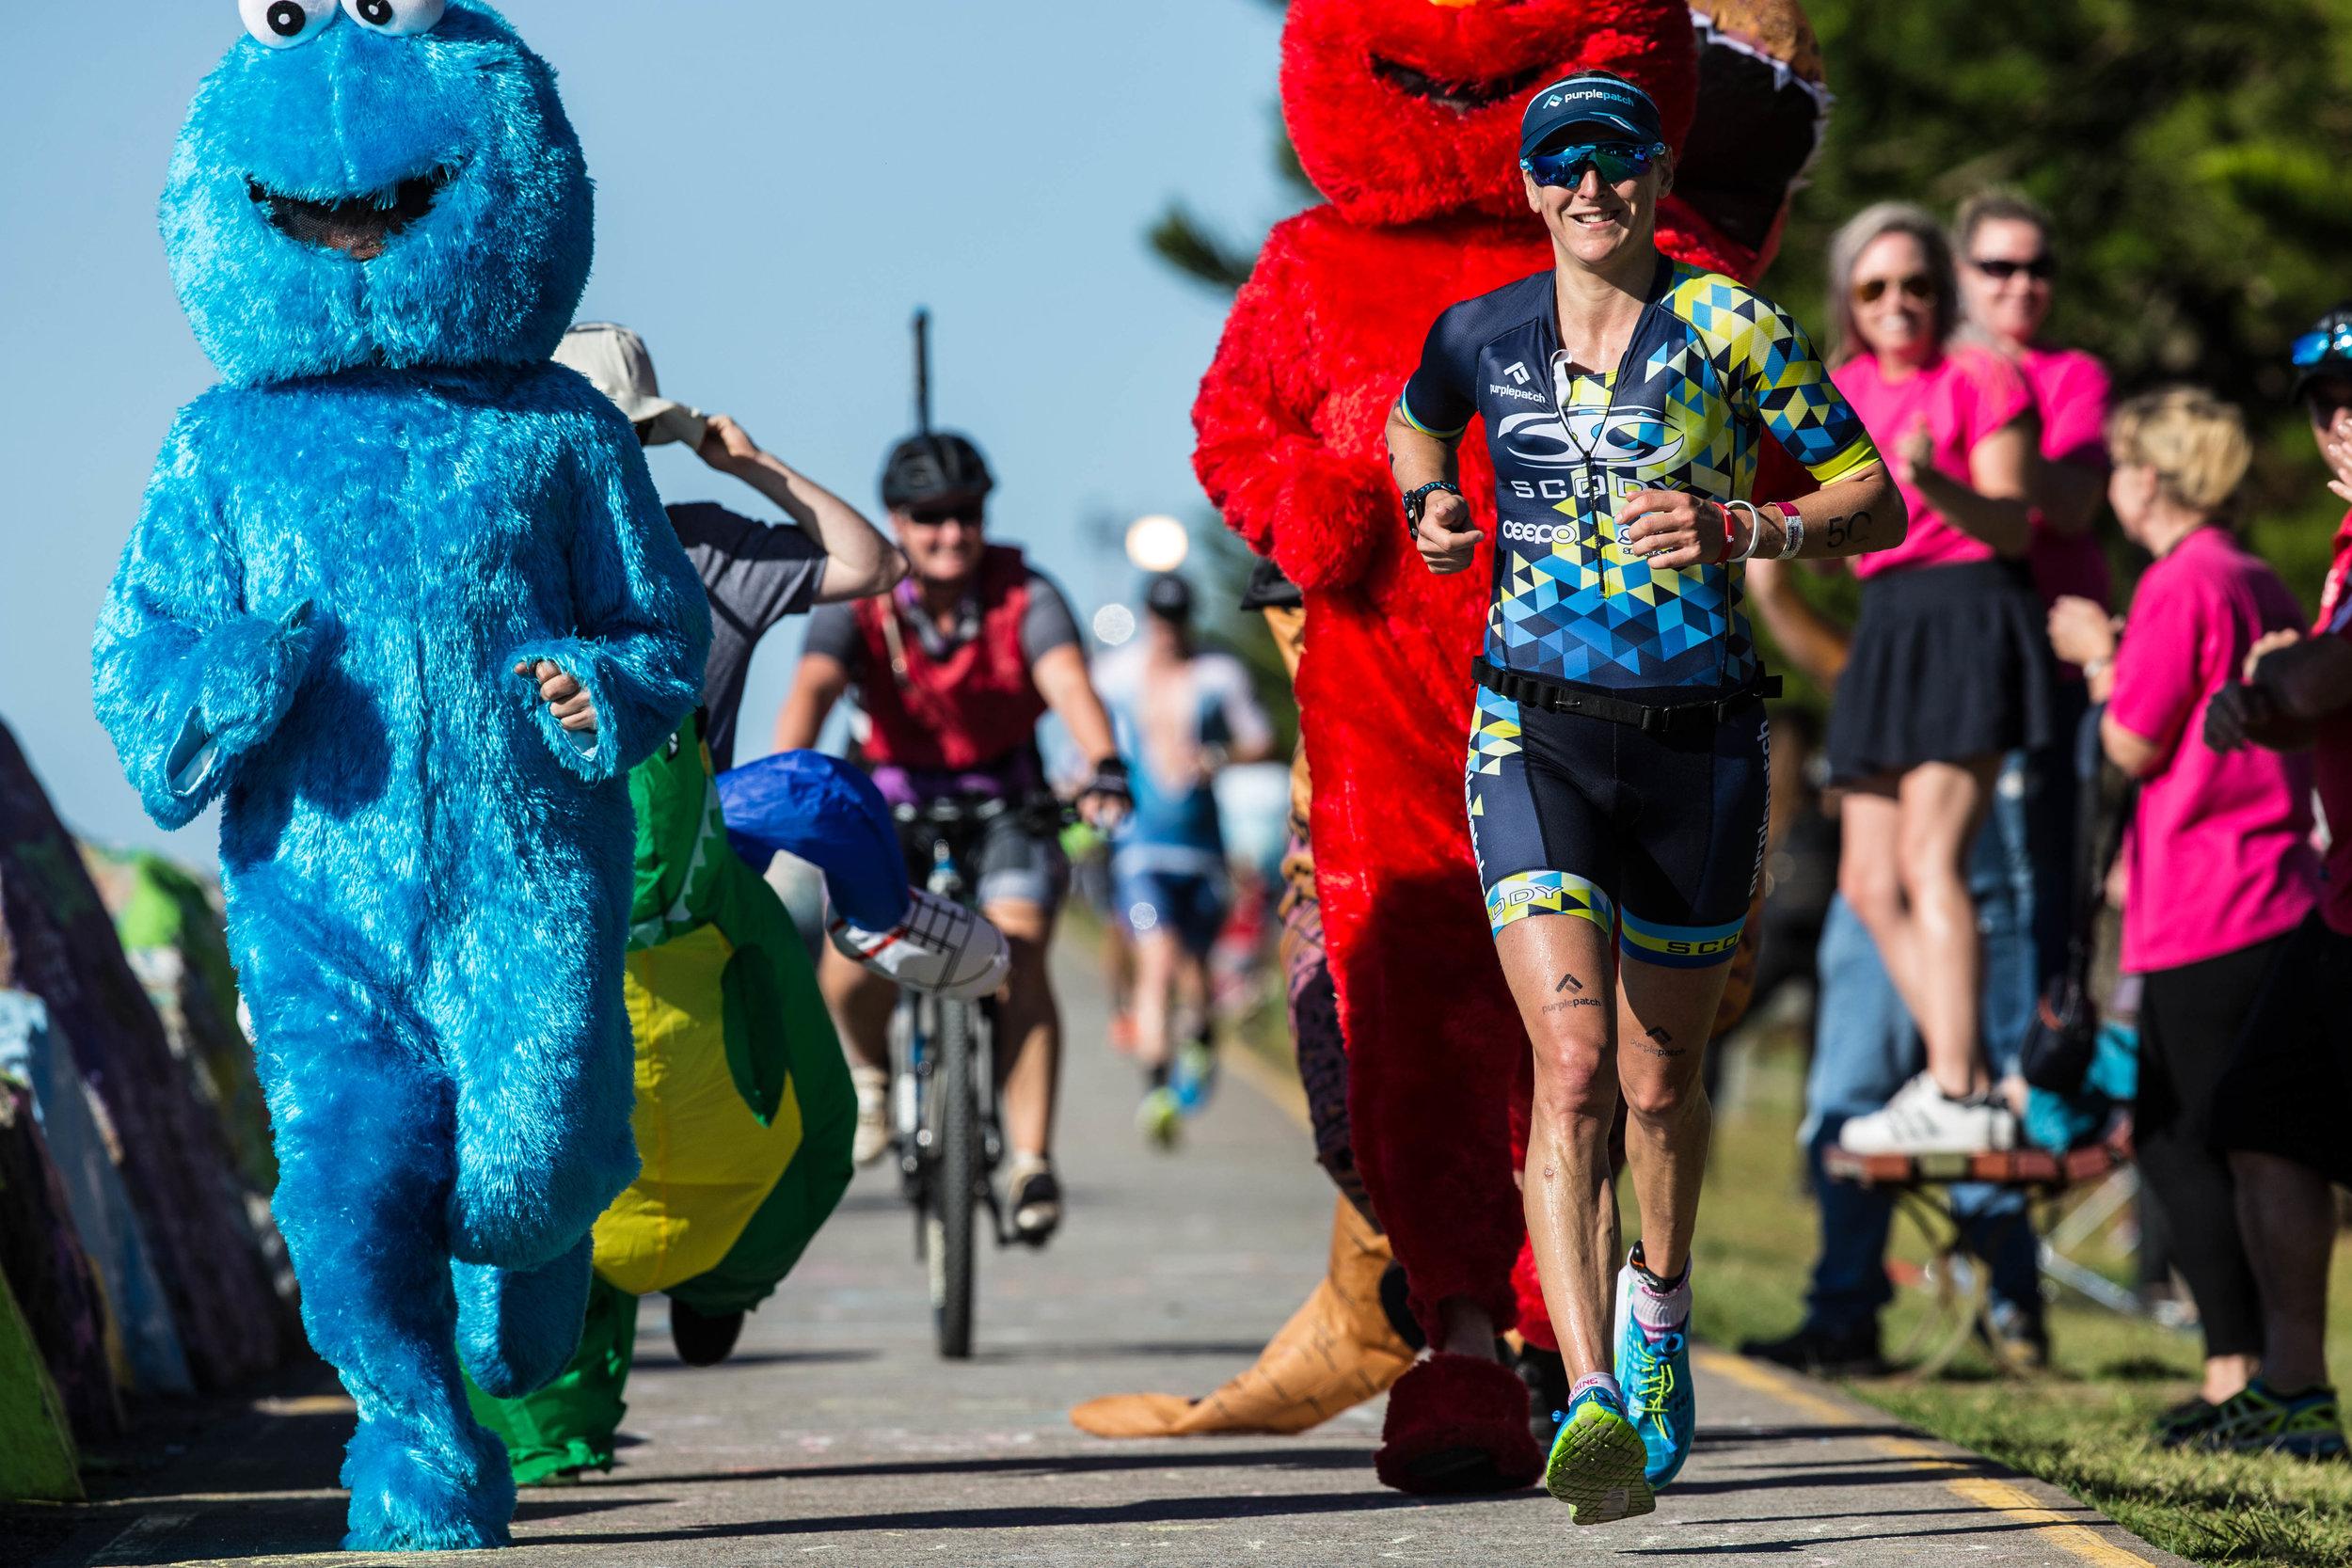 Laura Siddall had a few friends to help her through the marathon.